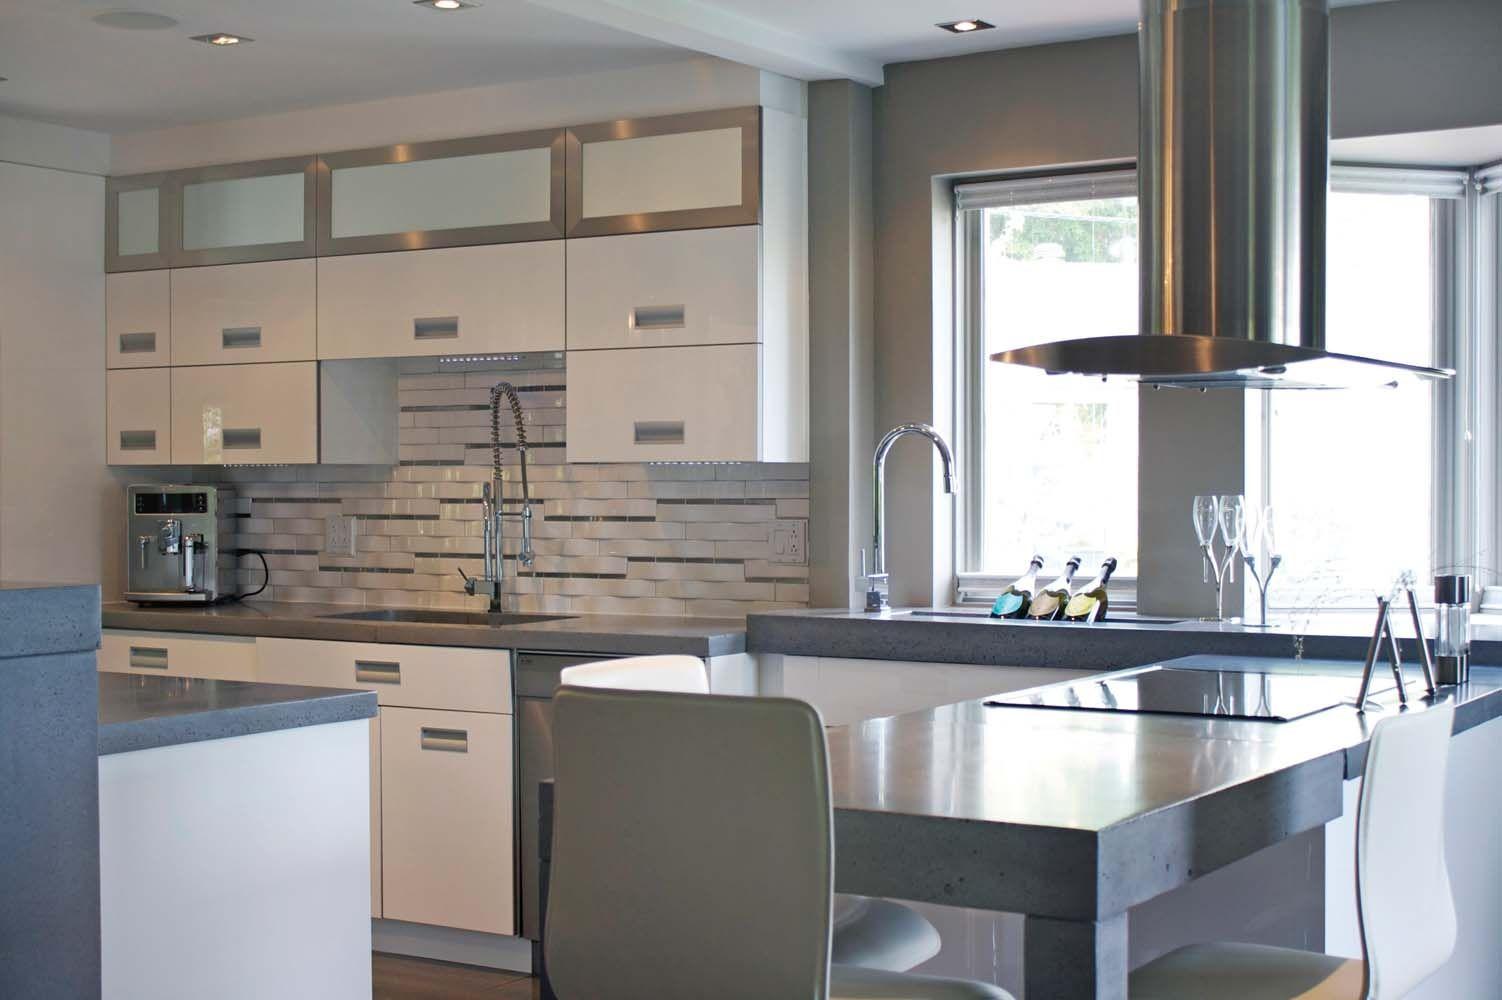 dosseret de cuisine moderne recherche google kitchen cabinets fashion all style pinterest. Black Bedroom Furniture Sets. Home Design Ideas